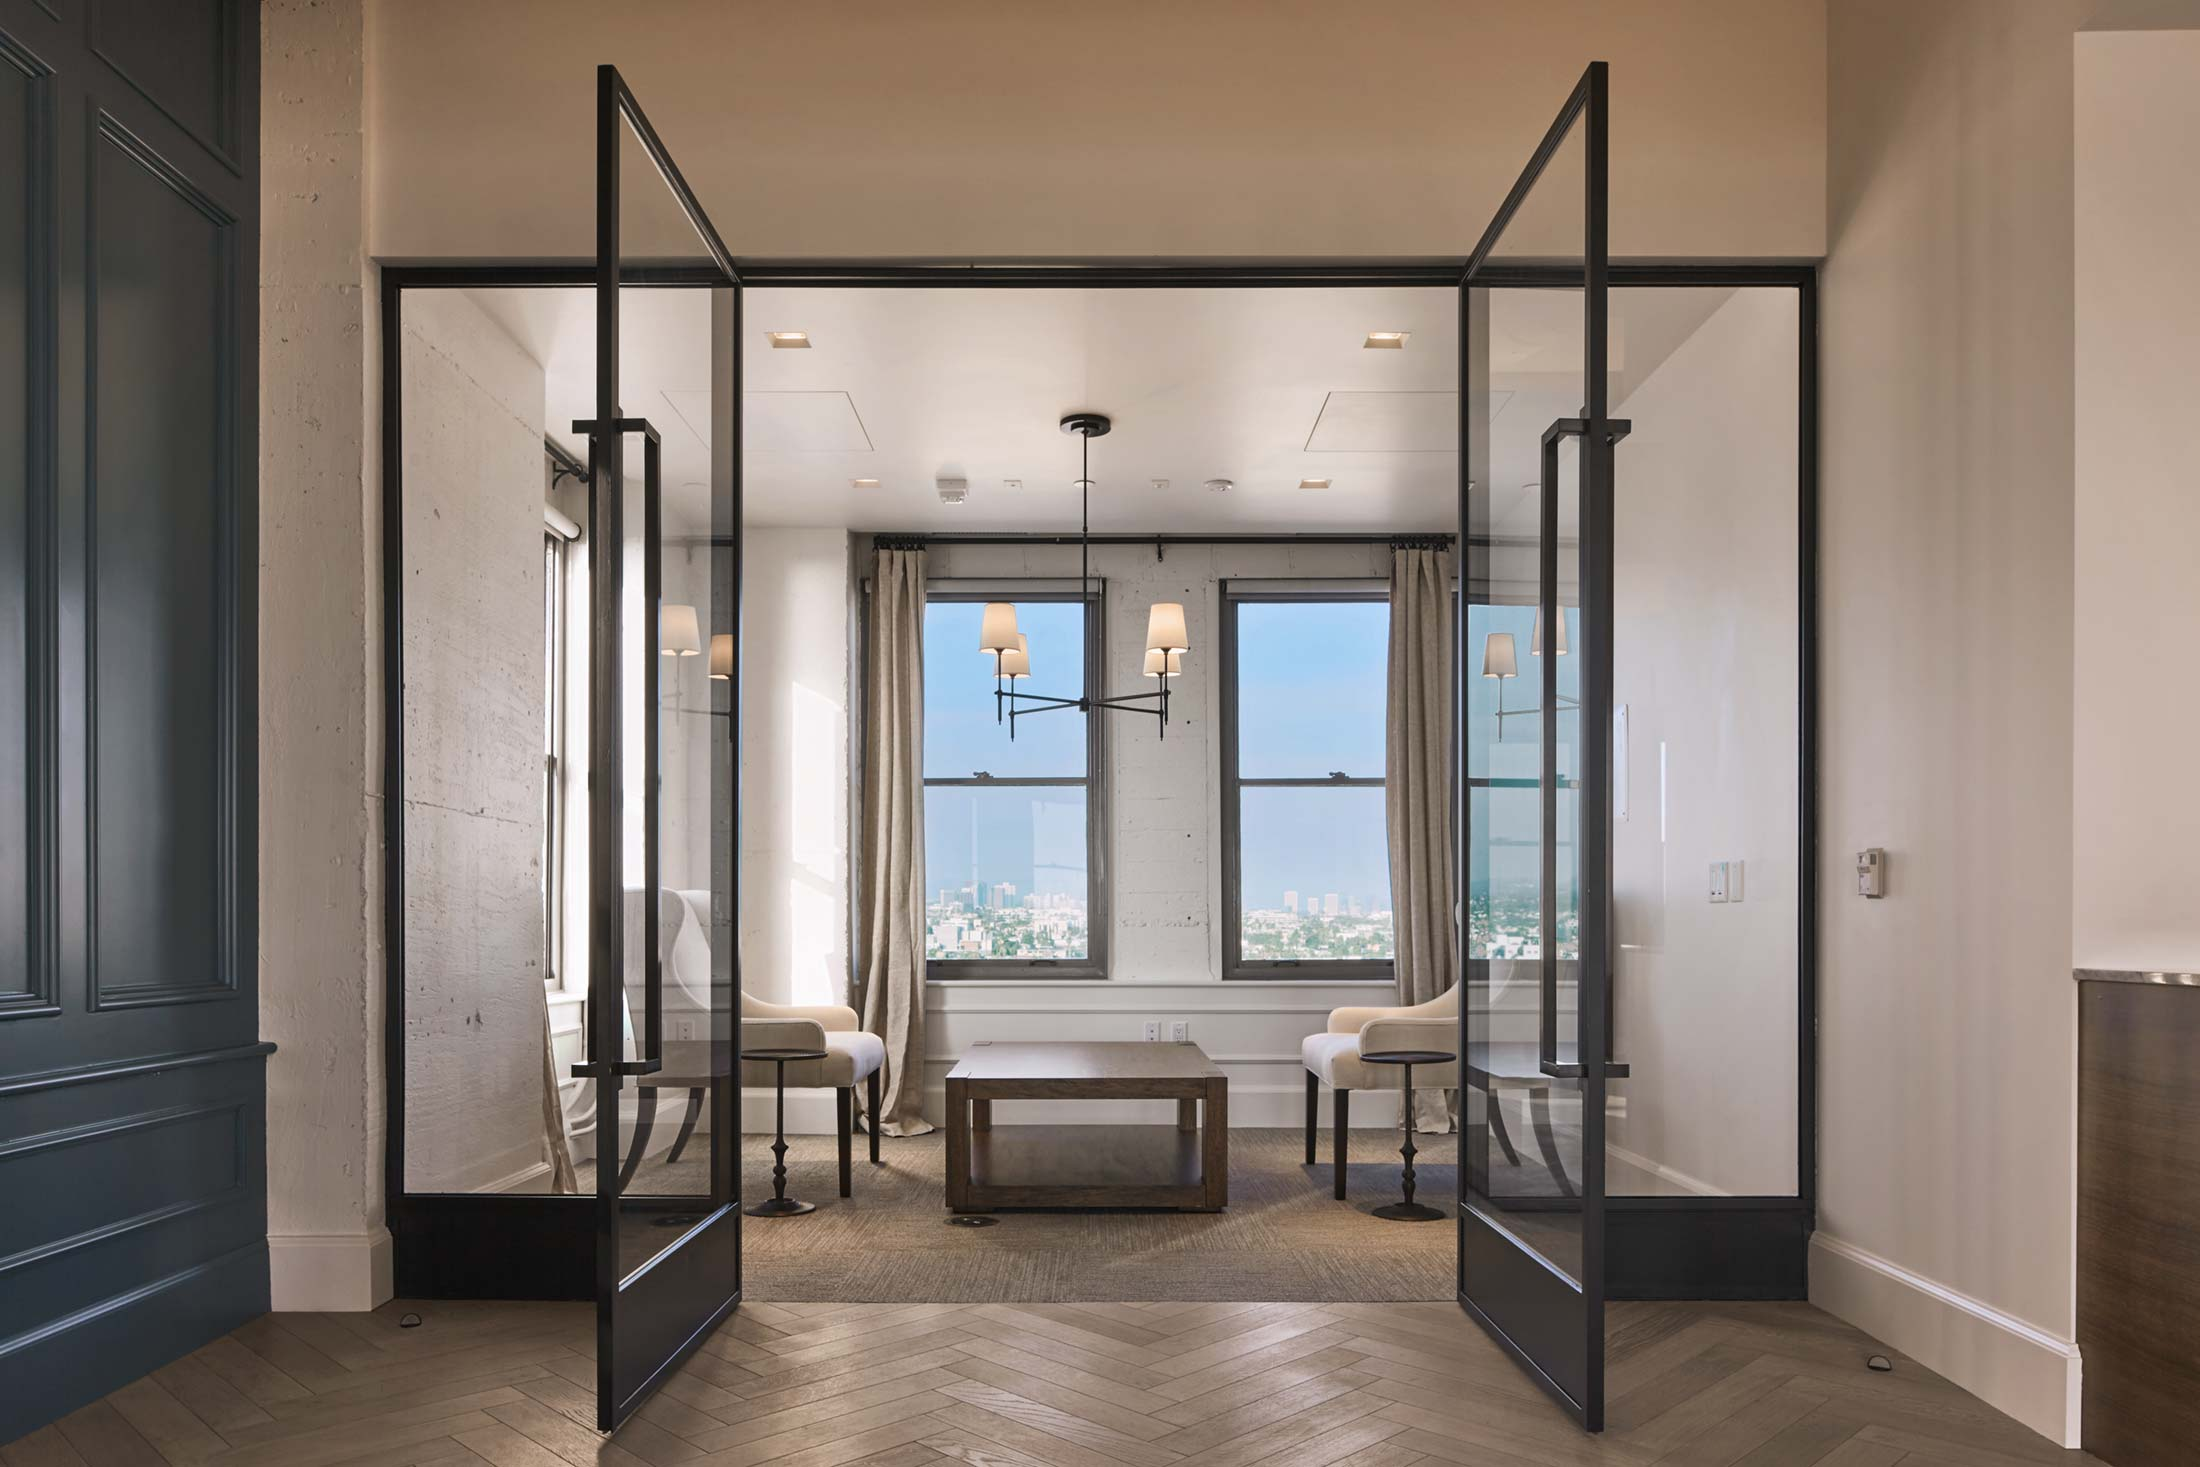 modern-architecture-commercial-interiors-office-california-shubindonaldson-truecar-clocktower-03